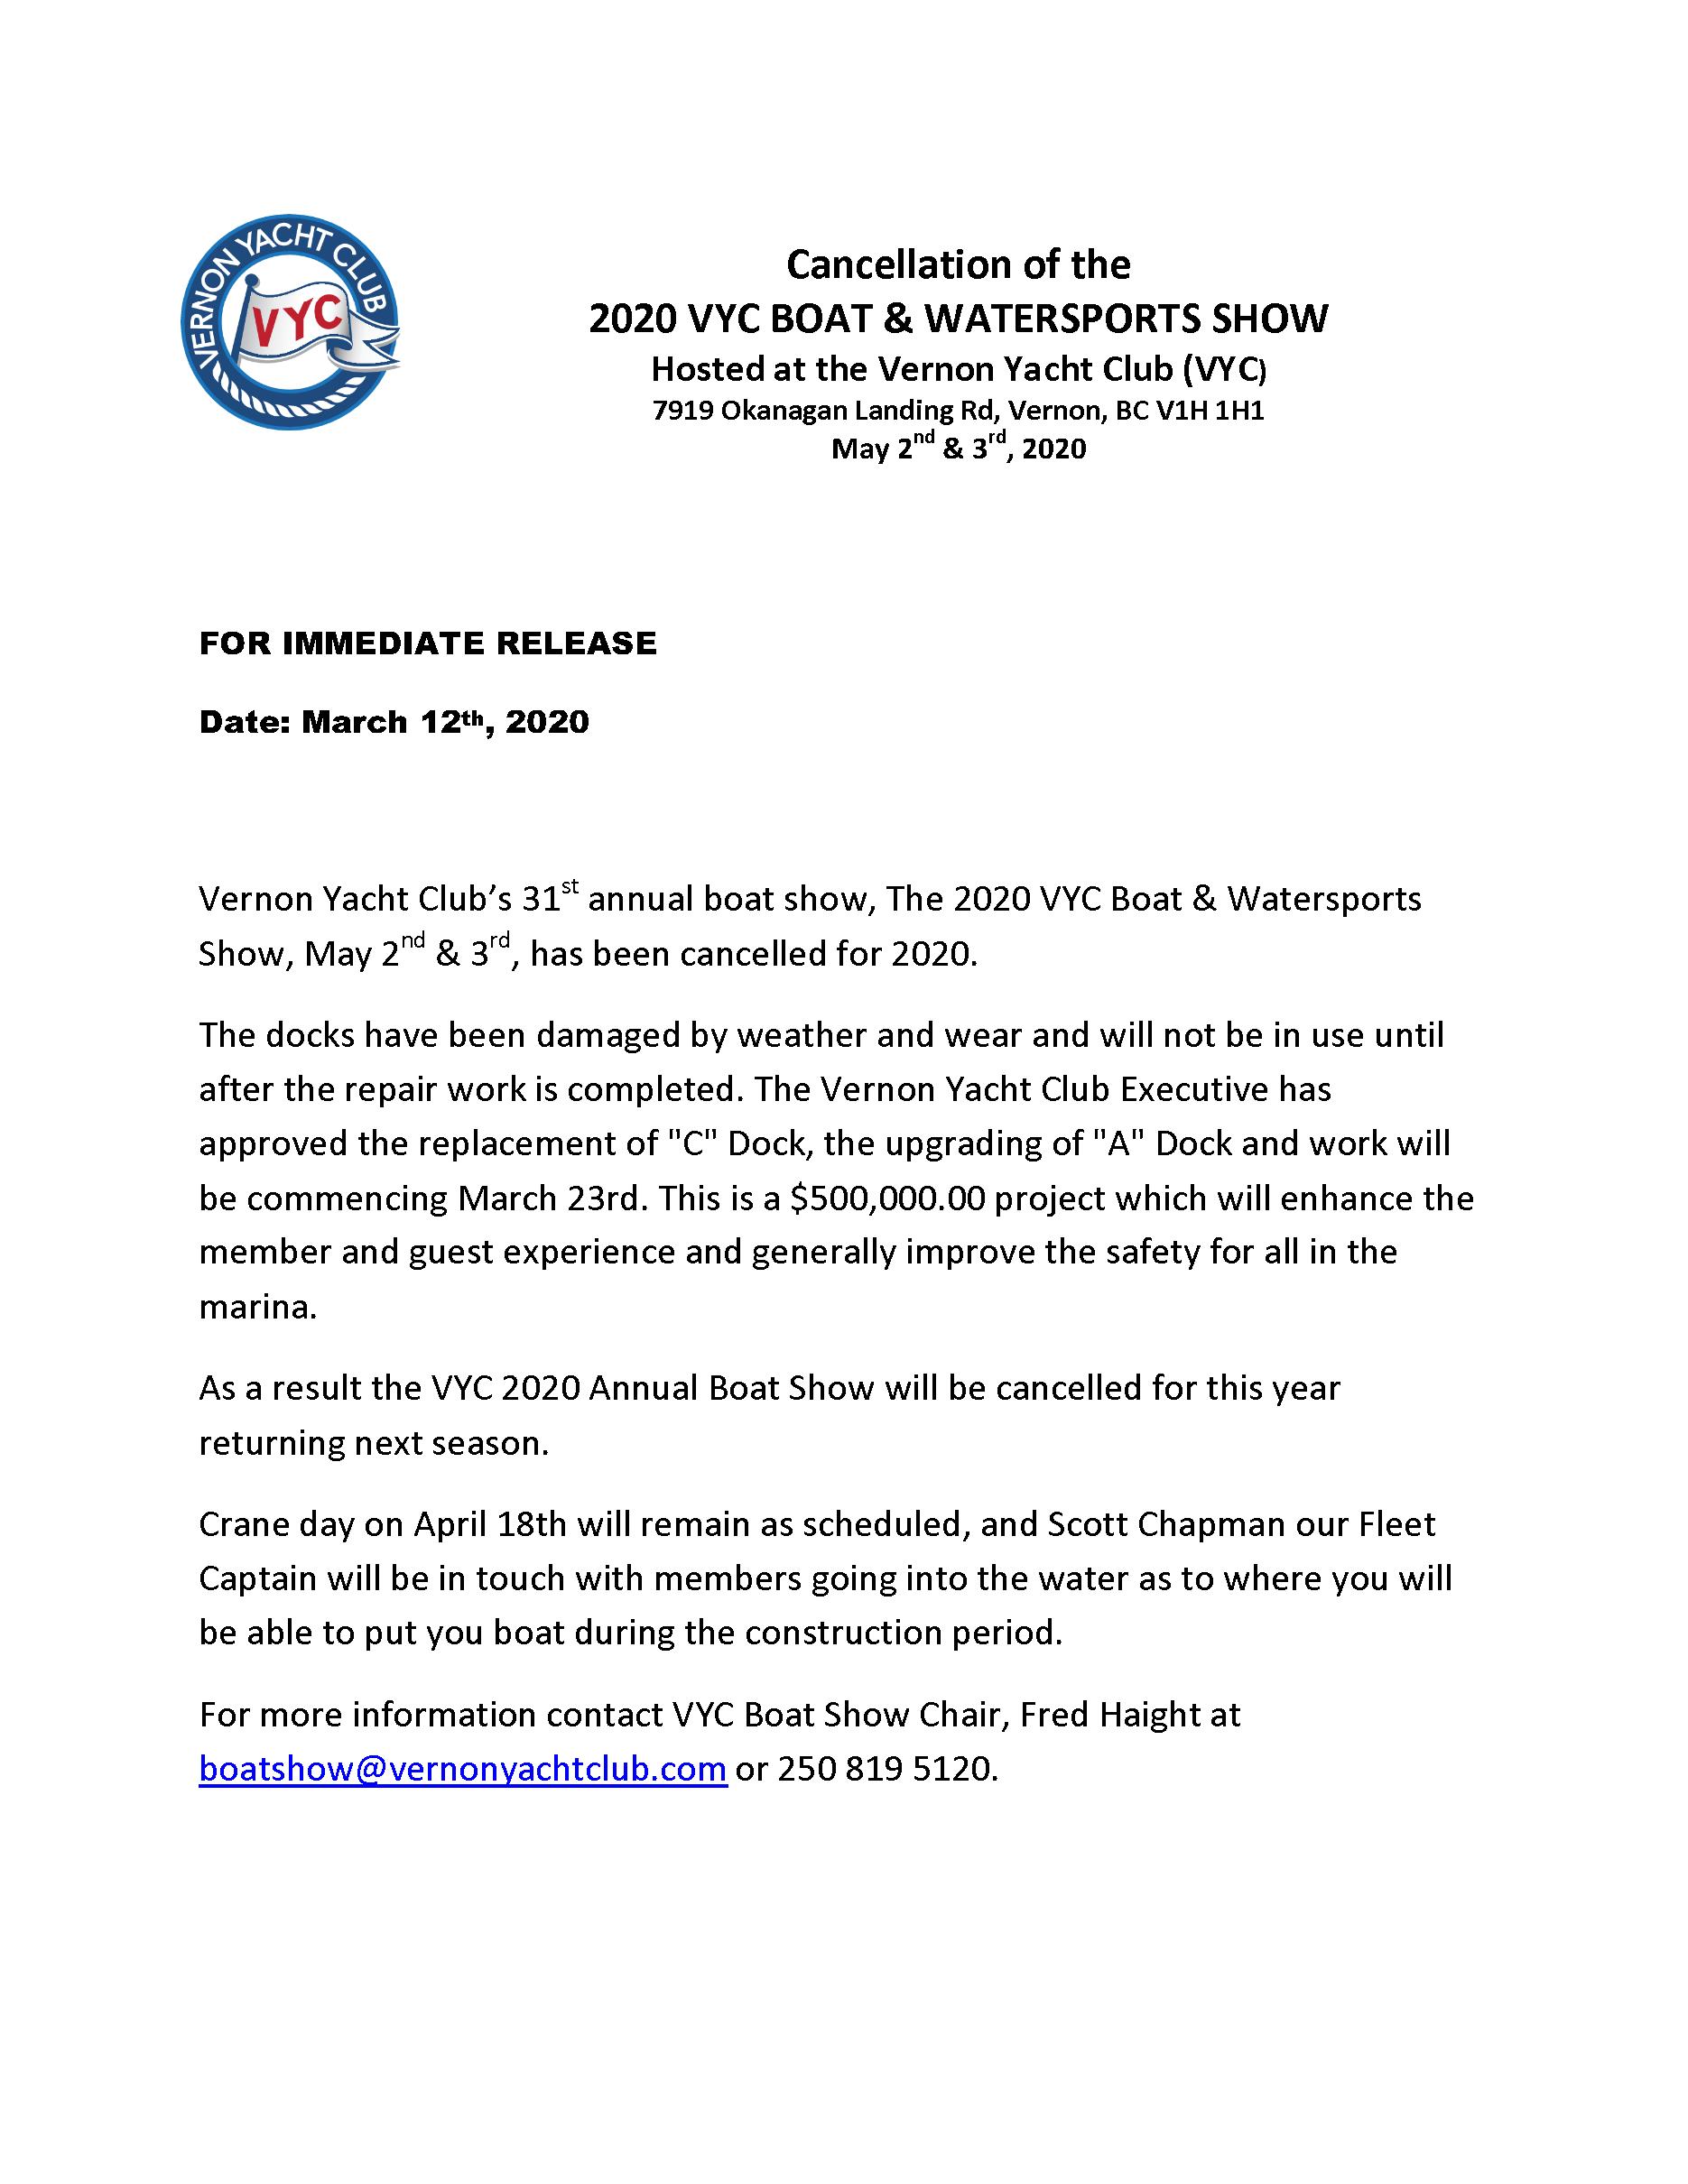 Vernon Yacht Club 2020 Boat Show Cancellation